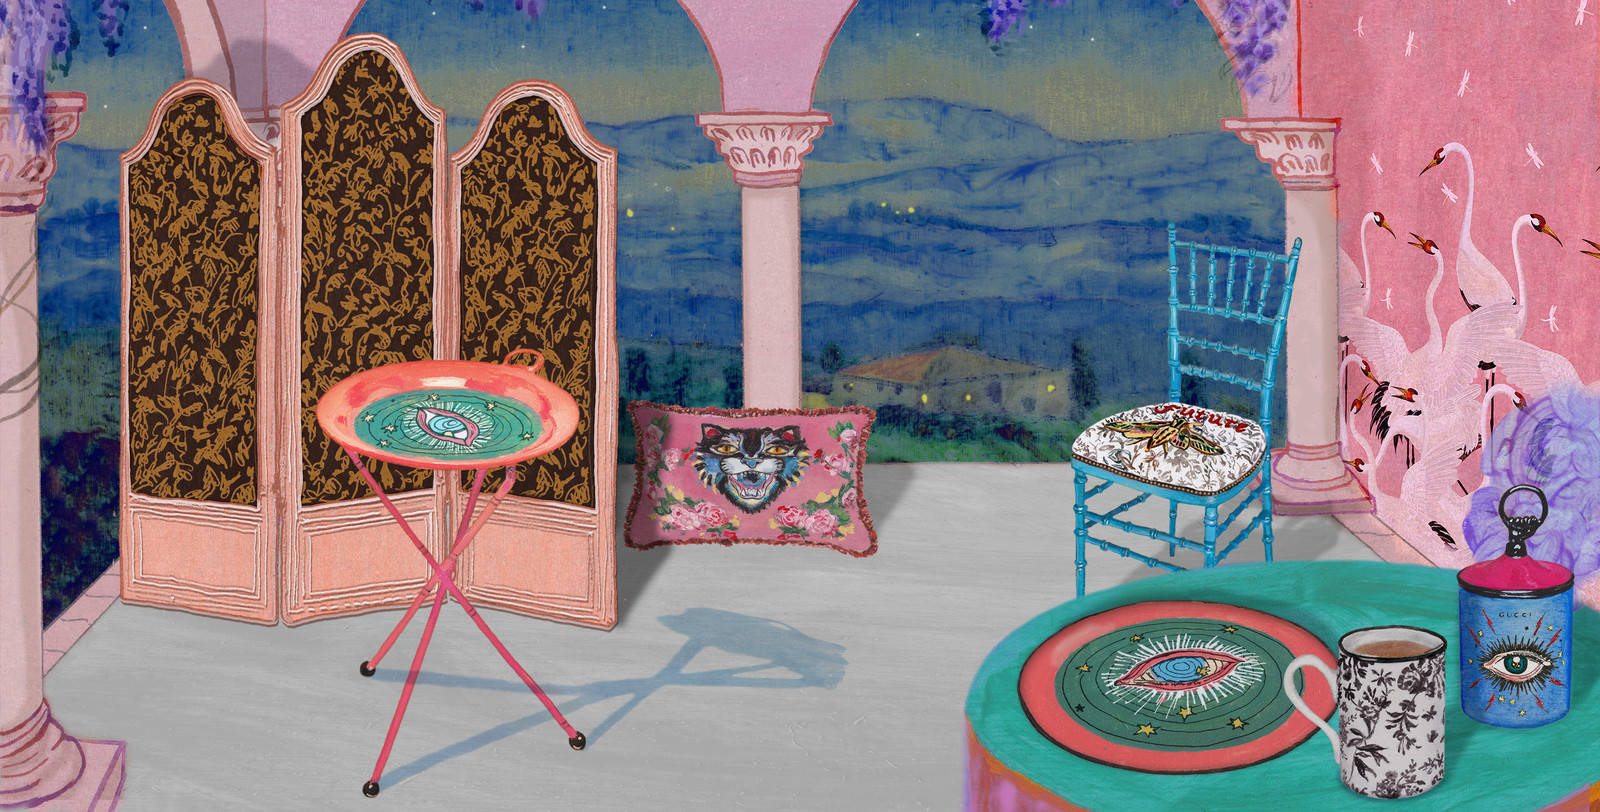 DiaryHeroArticle_Gucci-Decor-launch-illustrations-by-Alex-Merry-01_001_Default.jpg